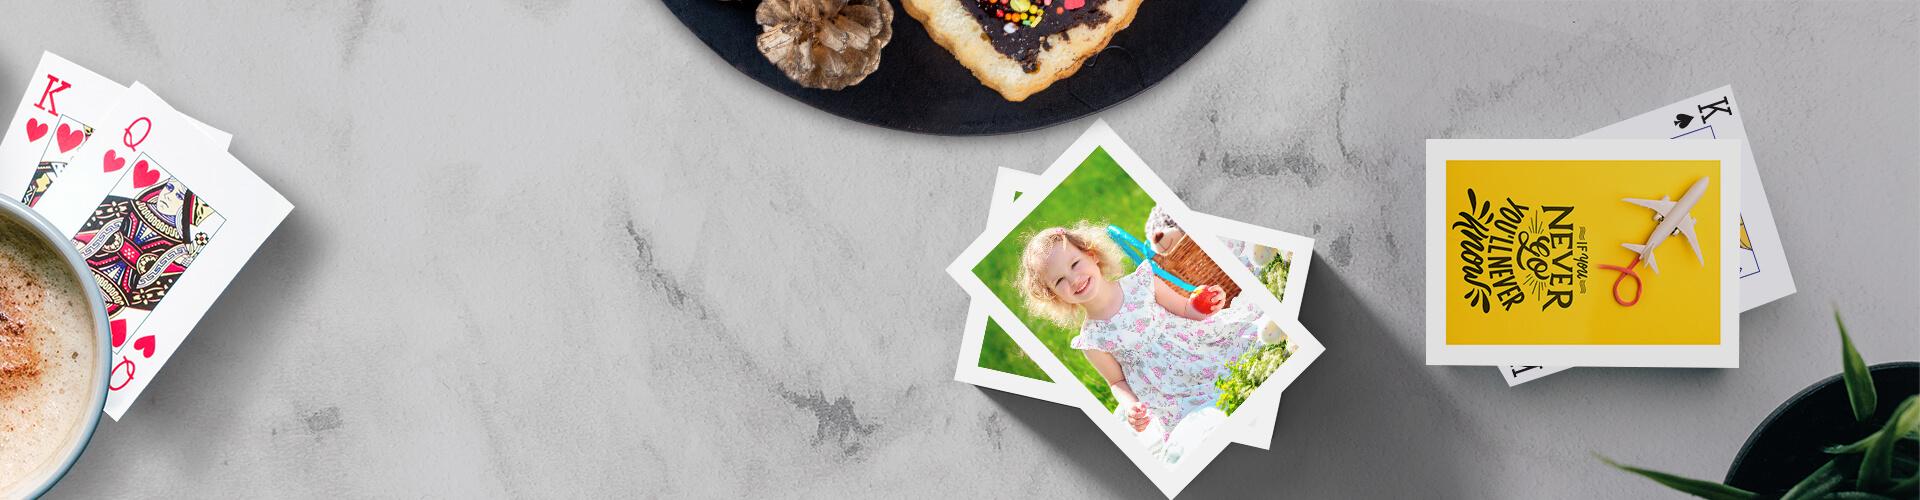 Customised Photo Playing Cards